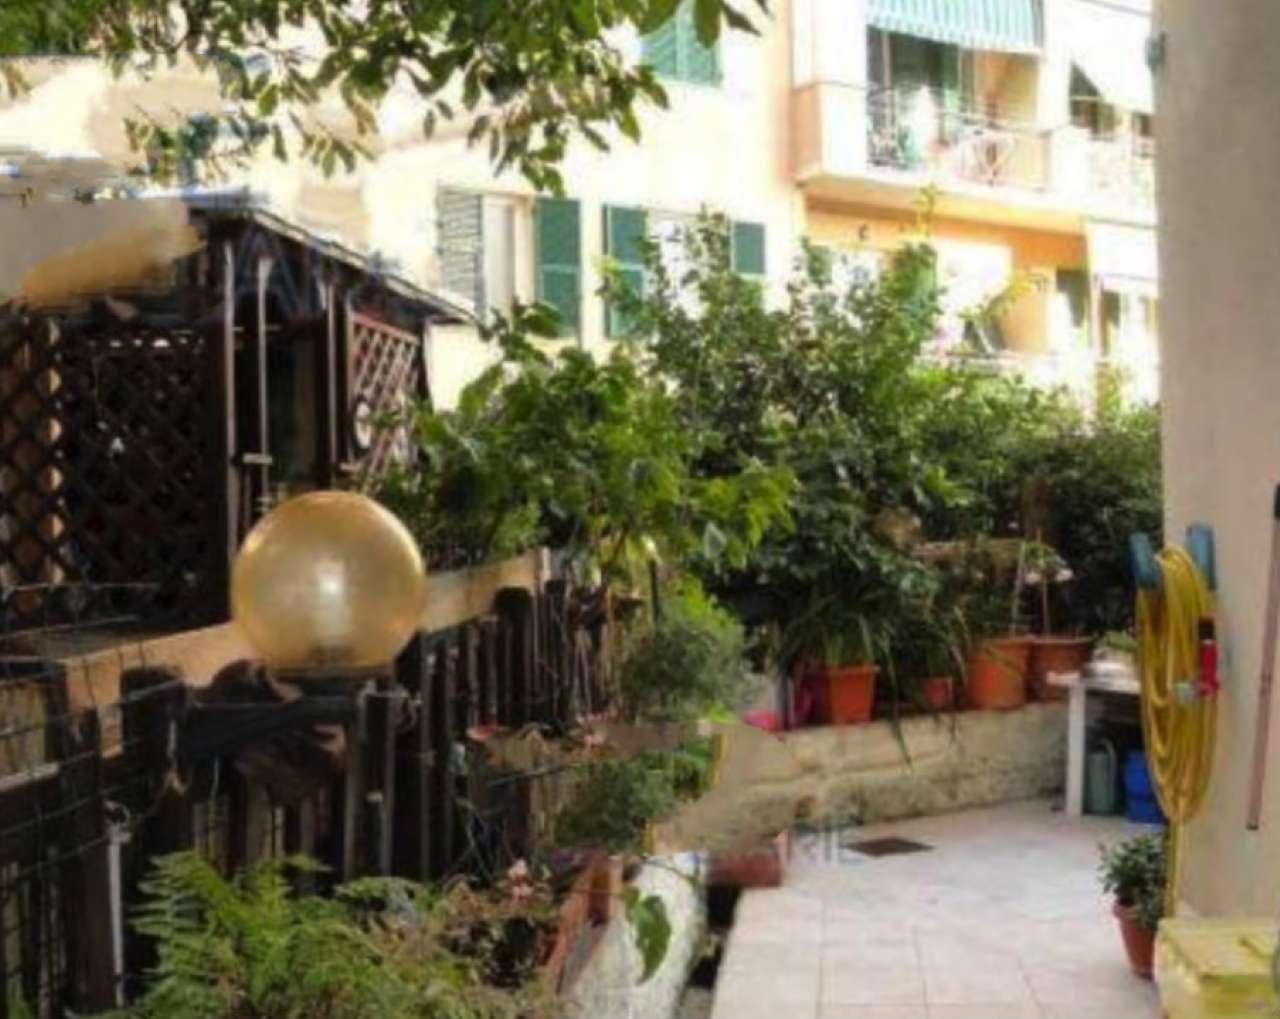 Foto 1 di Appartamento via G. DE VINCENZI 38, Genova (zona Valbisagno (Prato-Molassana-Struppa-S.Gottardo-S.Eusebio))